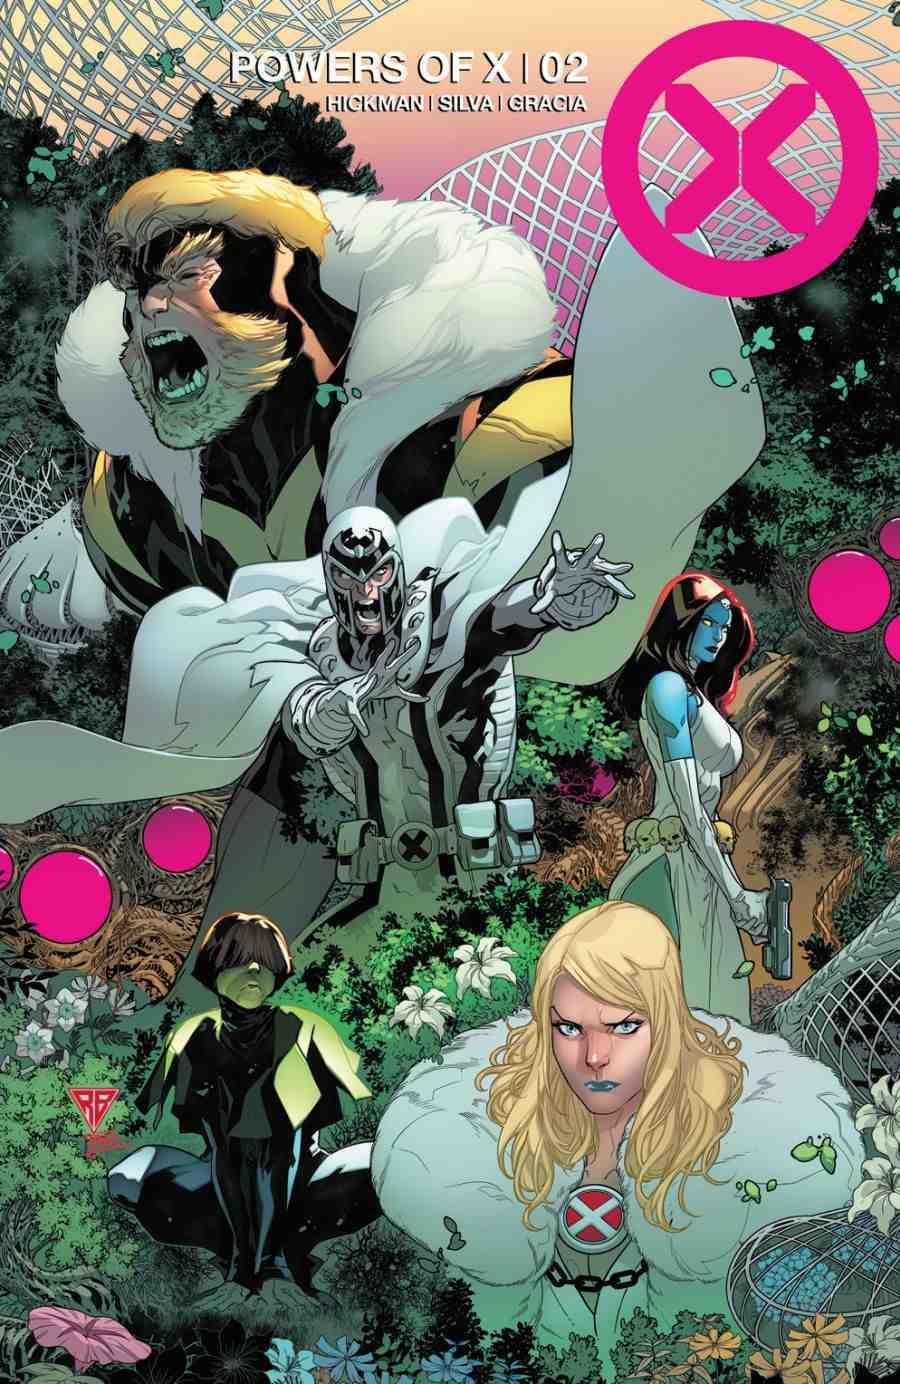 Os X-Men de Jonathan Hickman - Powers of X #2 - Blog Farofeiros